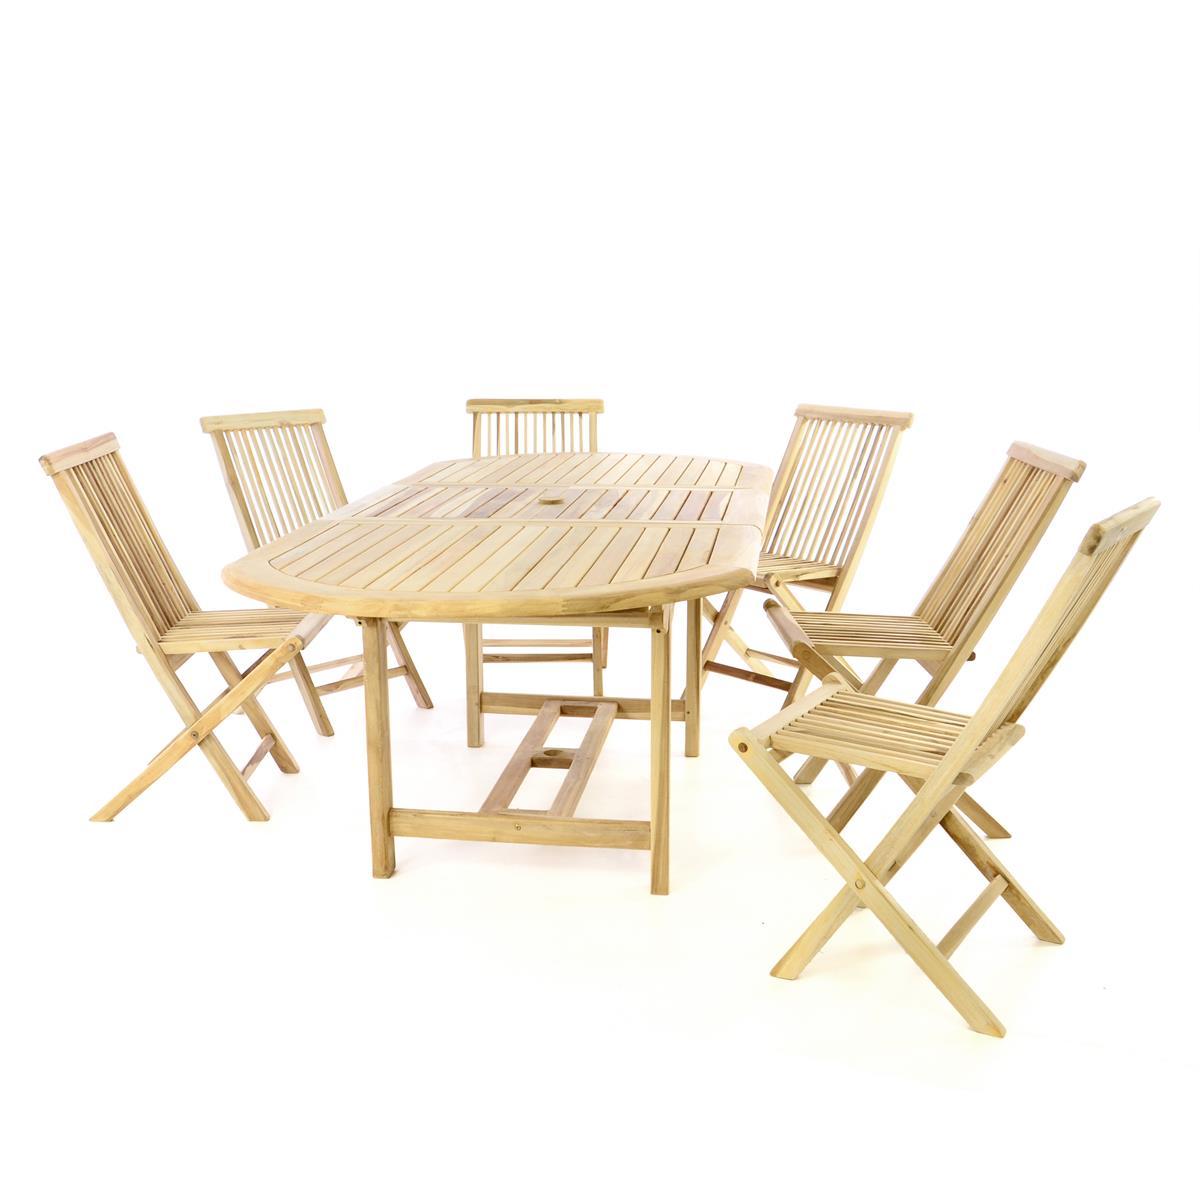 DIVERO Gartenmöbelset Sitzgruppe 6 Stühle Tisch 170/230 cm Teakholz natur